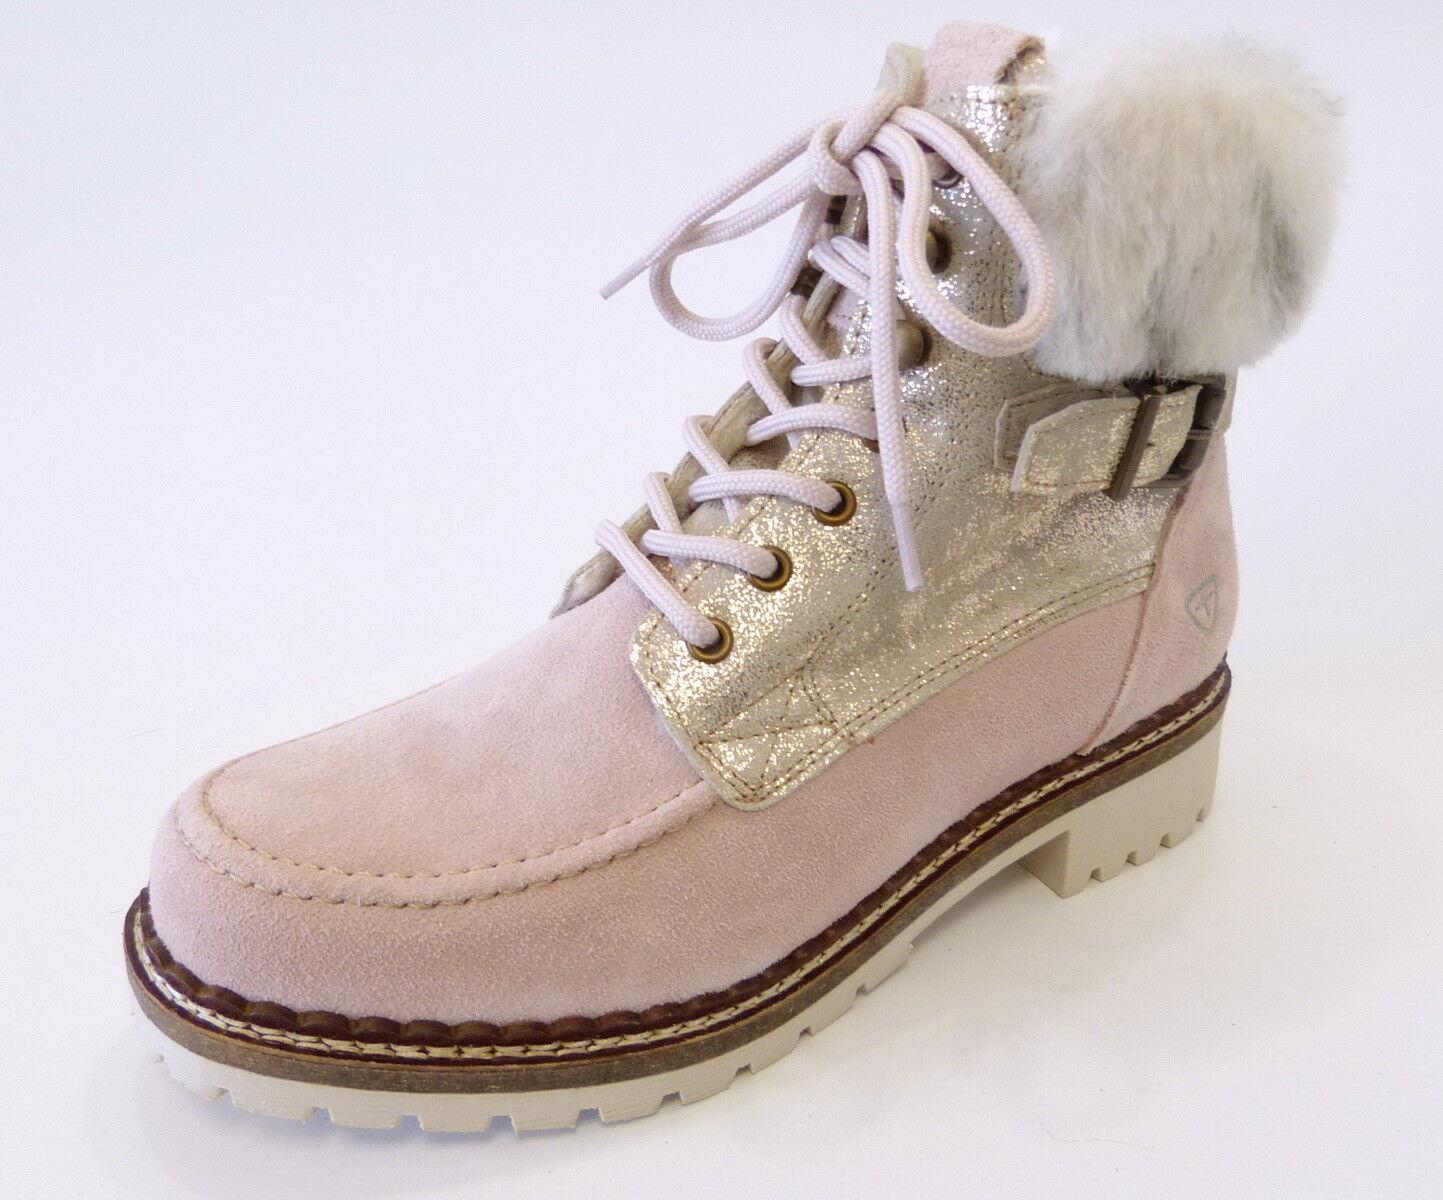 Tamaris Stiefel Stiefel 26076 554 light Rosa Rosa warm  Wolle Futter Nubuk Leder    | Großhandel